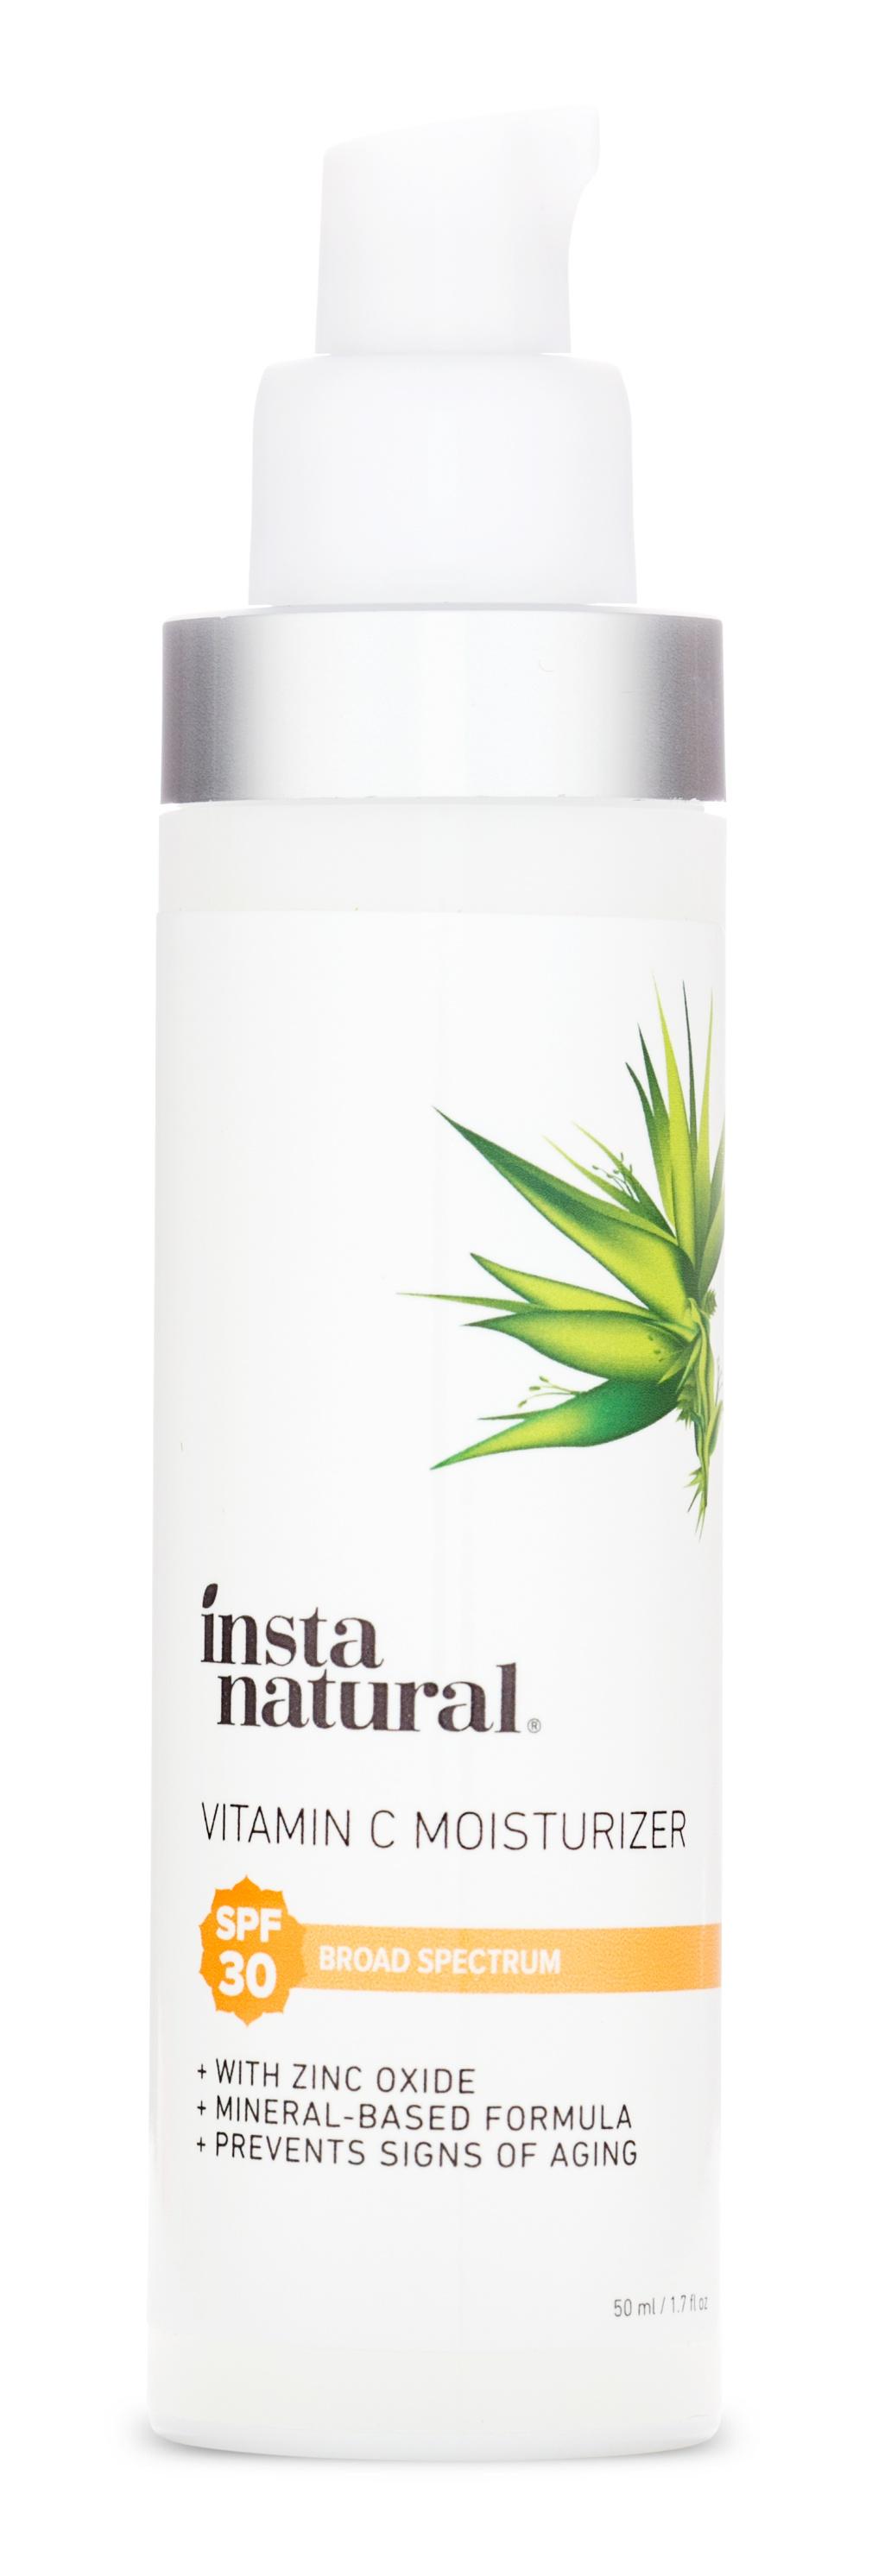 Insta Natural Vitamin C Moisturizer Spf 30